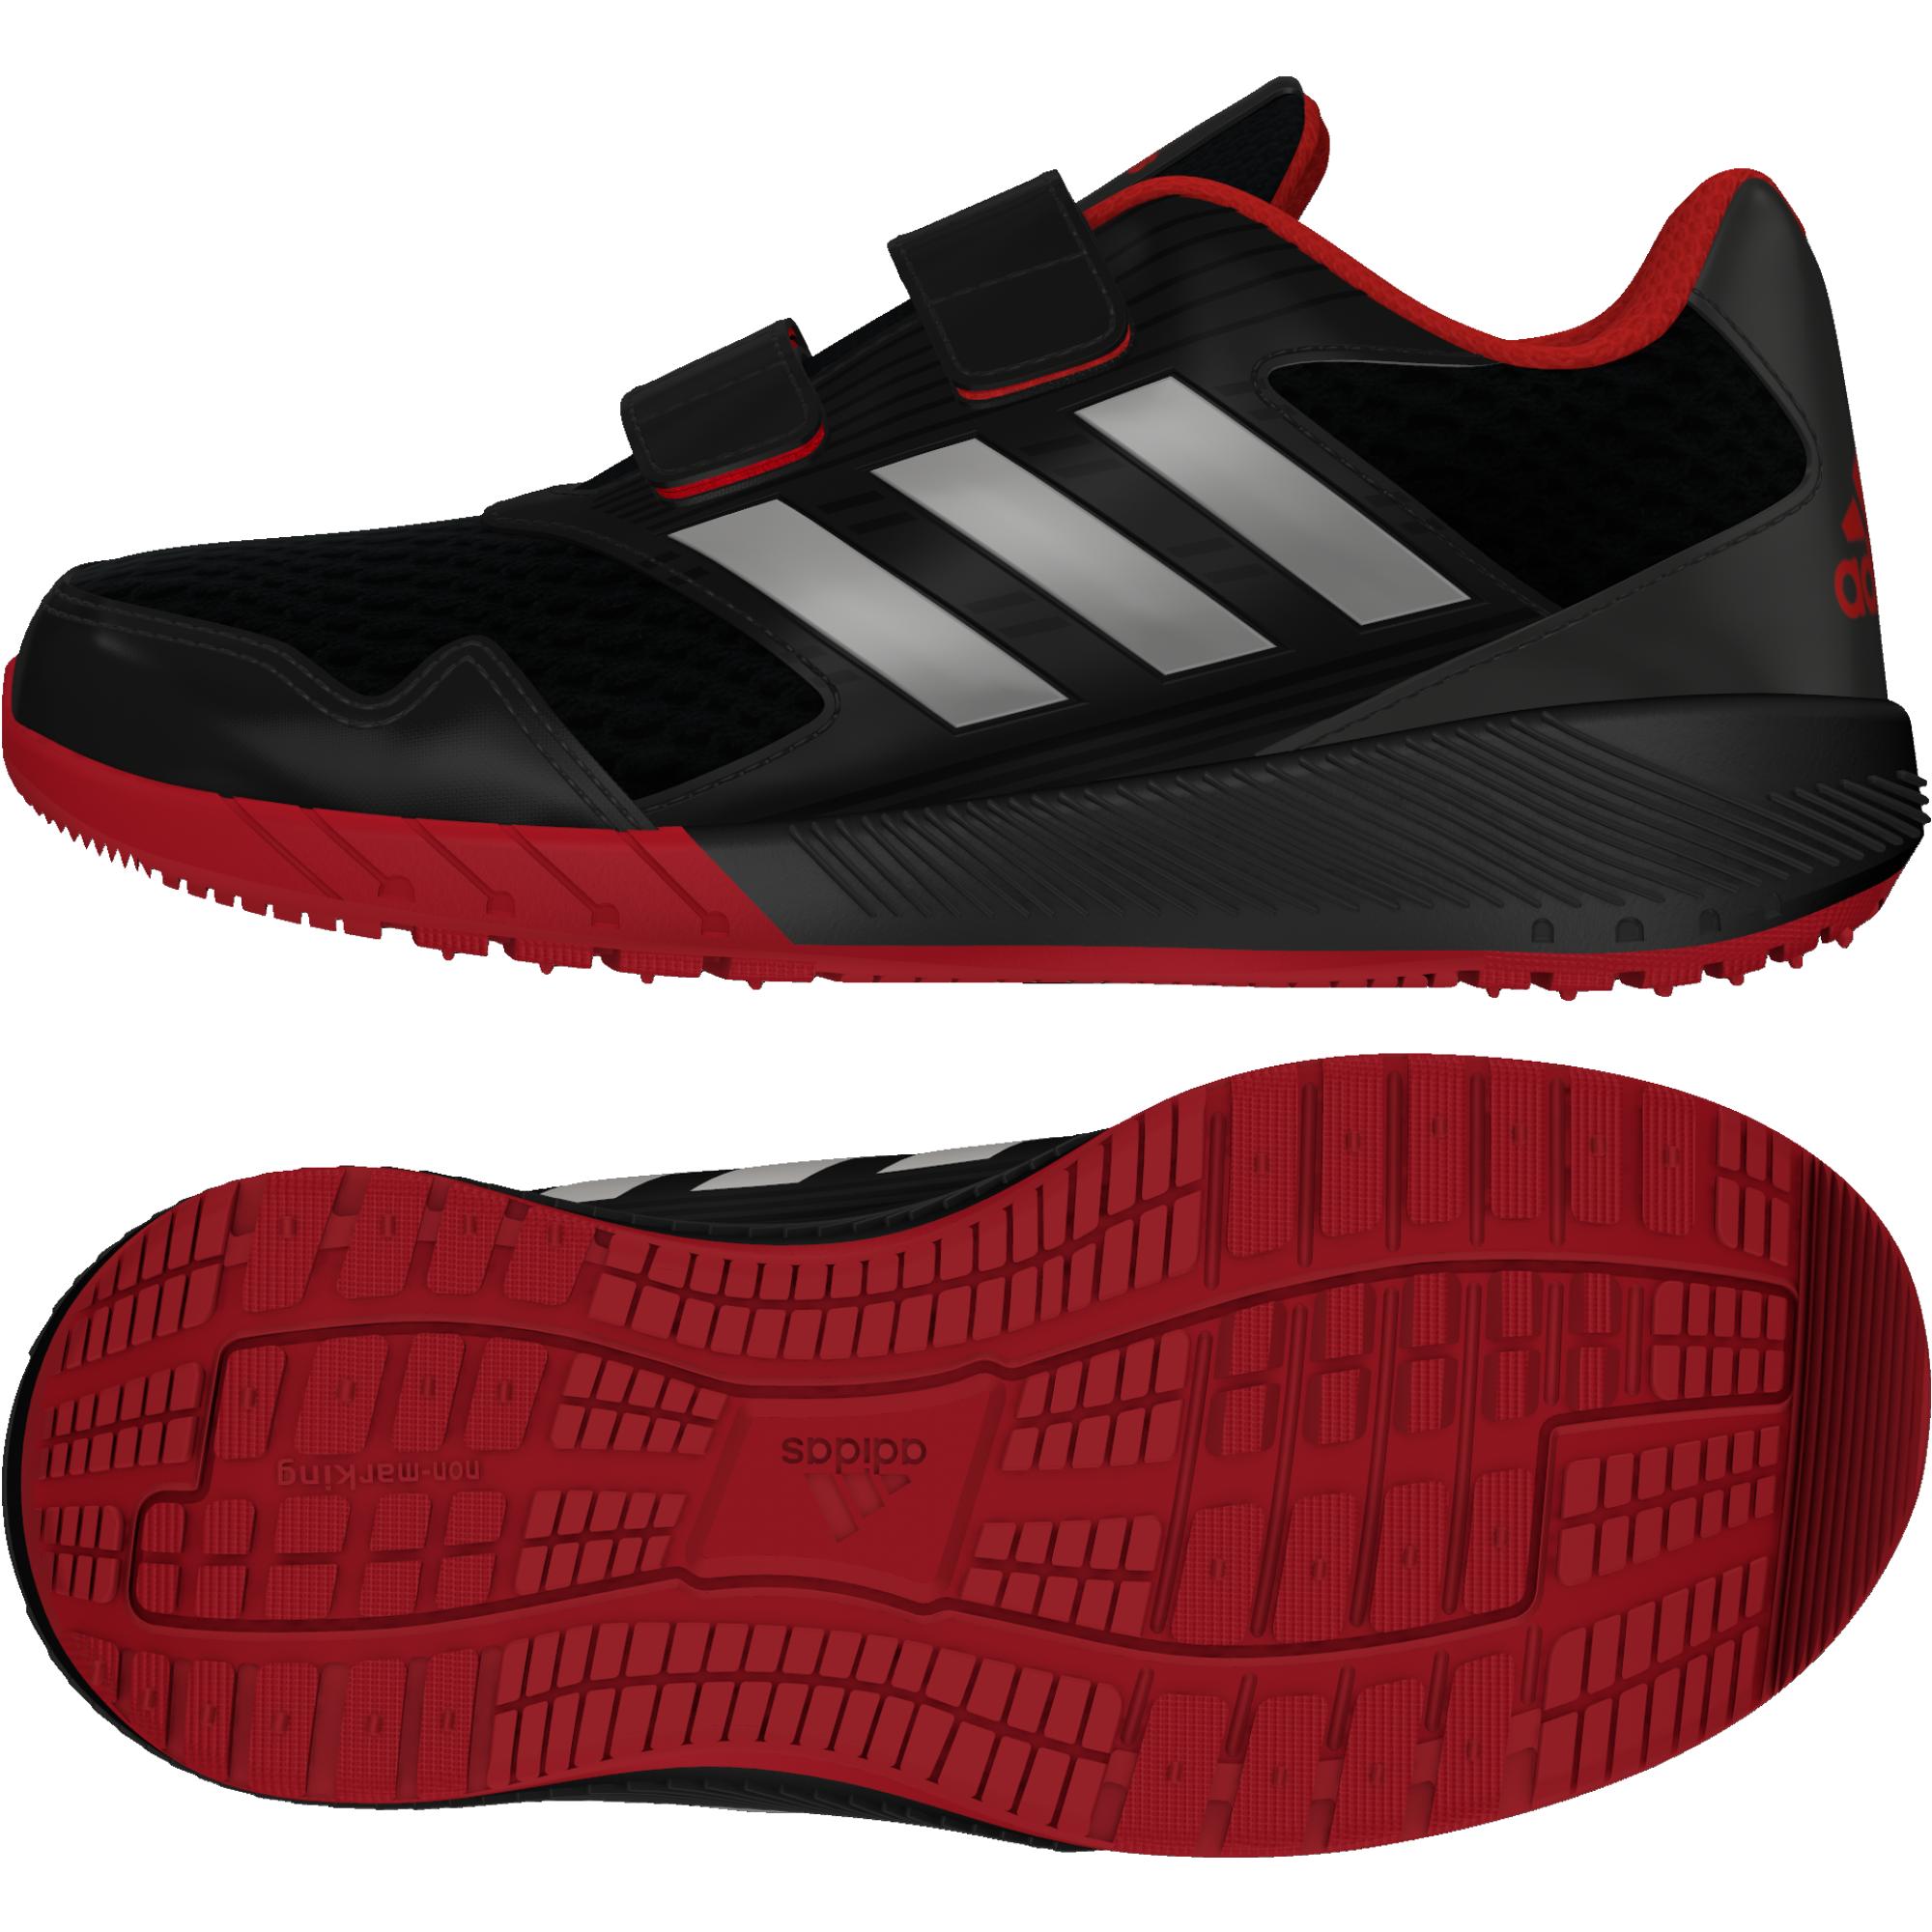 Adidas Altarun Cf K kisfiú utcai cipő  a6178ff7a2